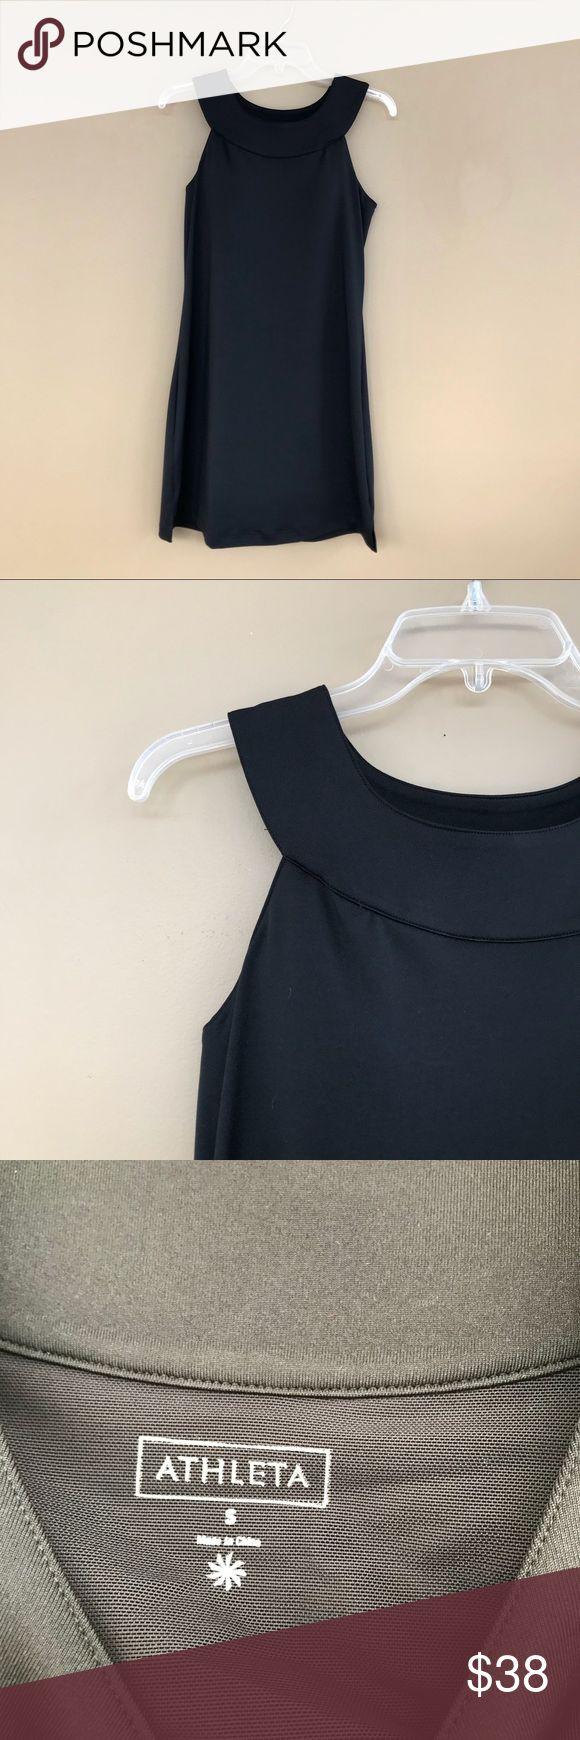 "• Athleta • Black Athletic Dress Built in Bra S - Athleta - Black Dress - Small - Length 34""  - Built in Bra - Excellent Condition Athleta Dresses"